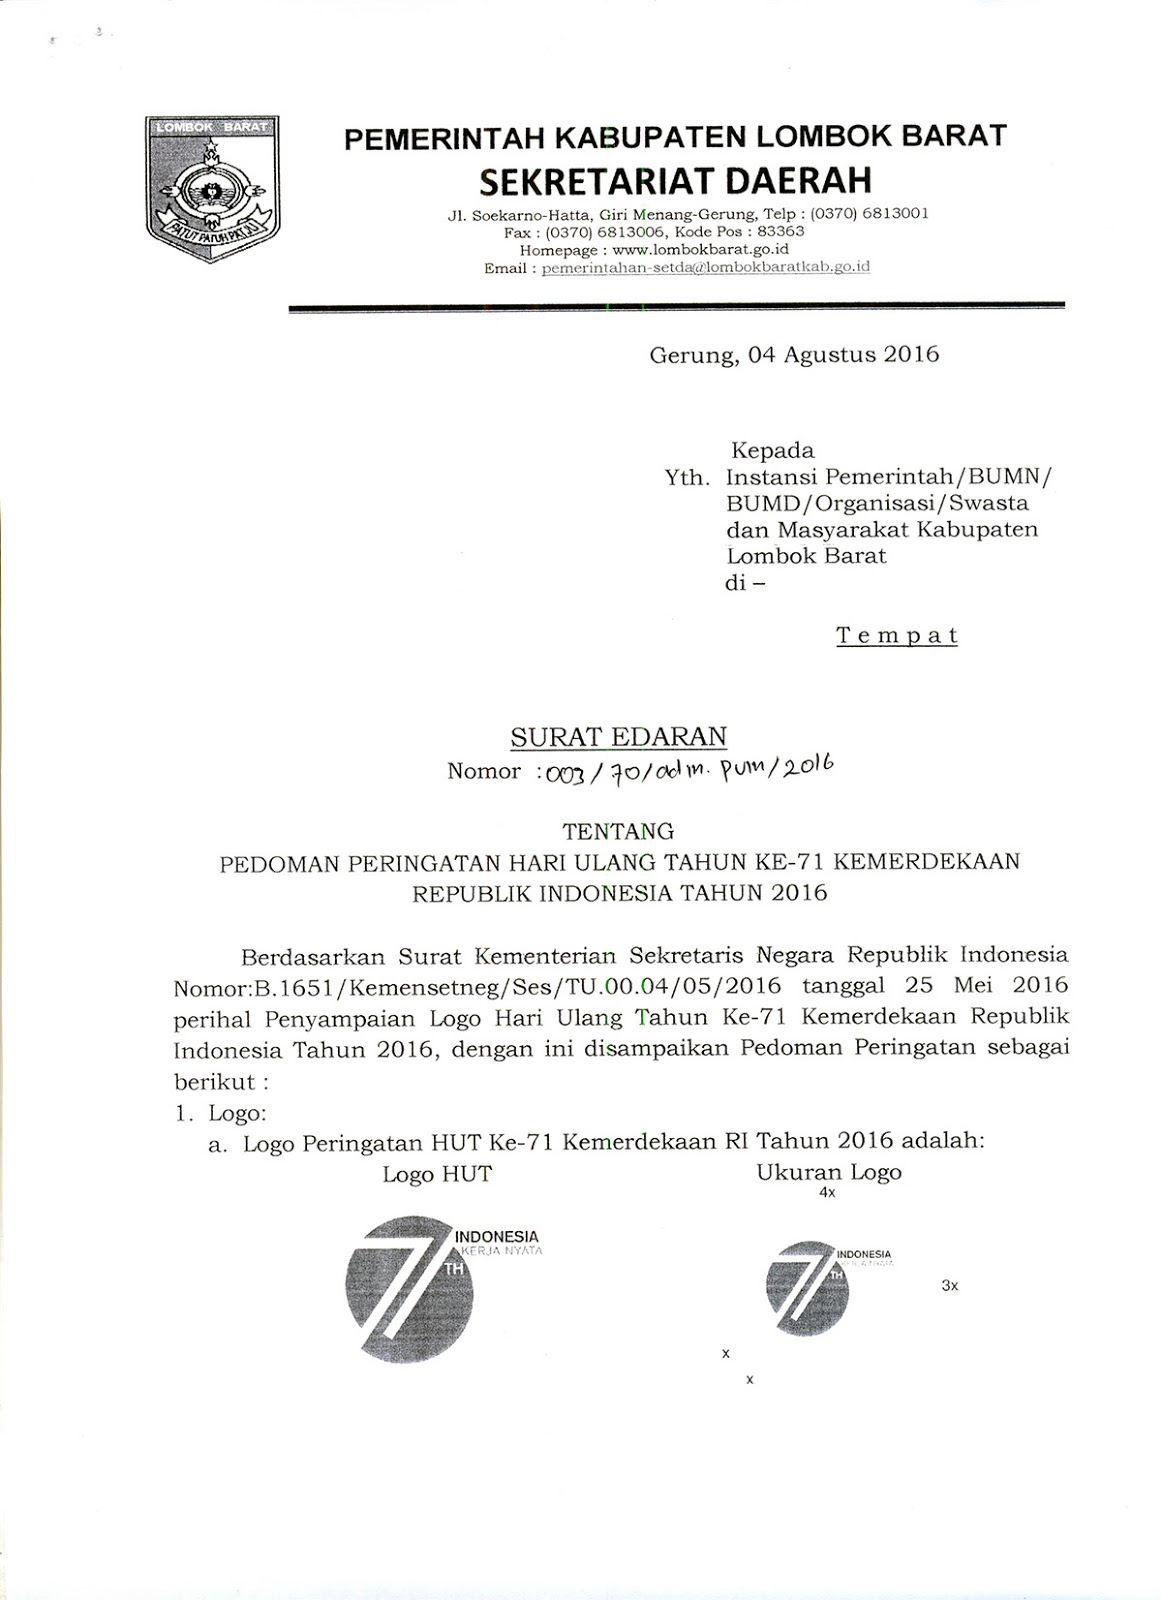 Contoh Surat Undangan Setengah Resmi Yaitu Surat Nusagates